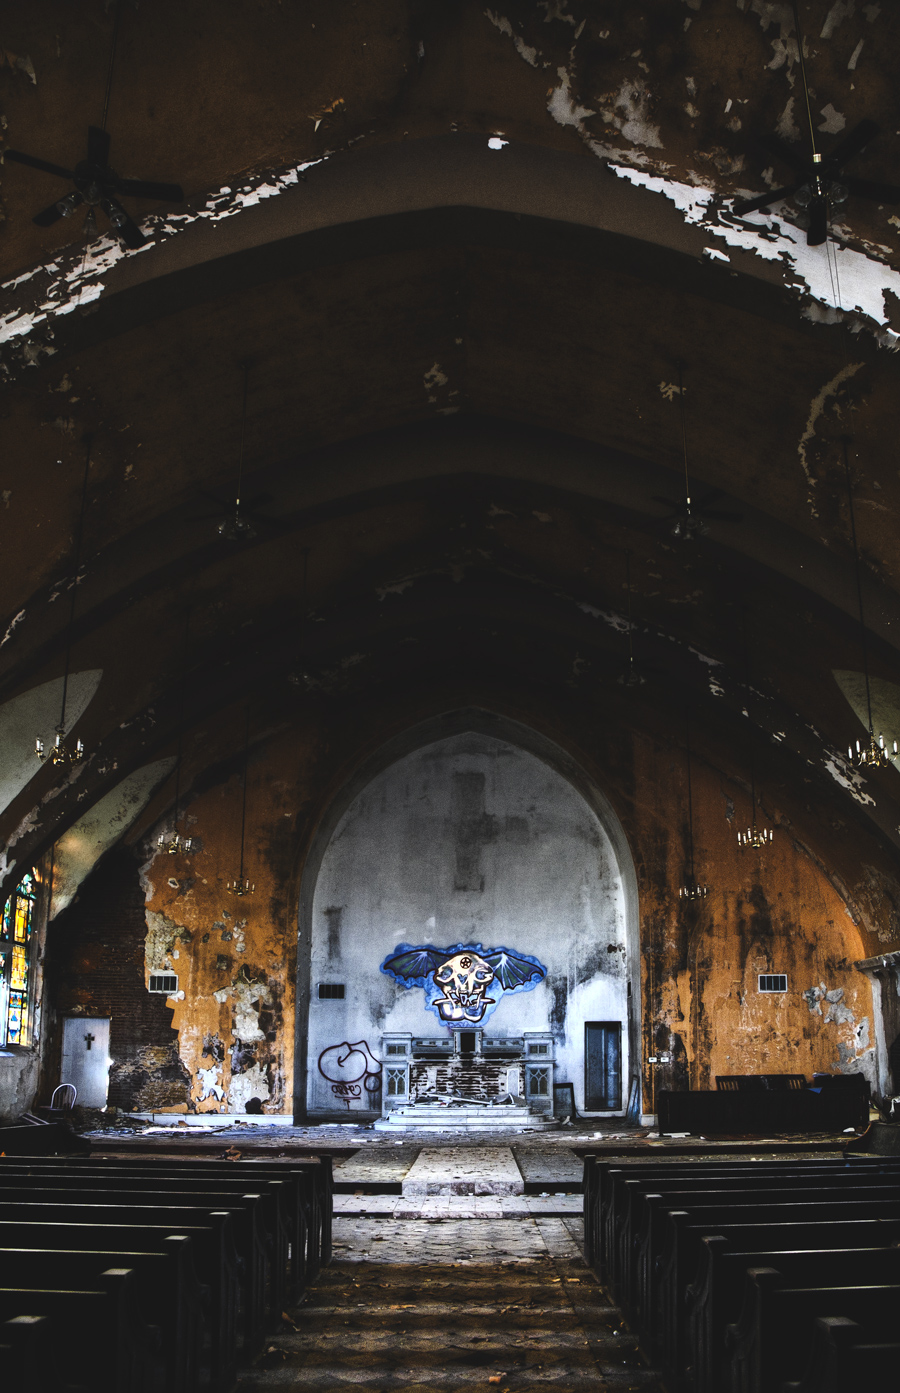 st-marks-church-web.jpg